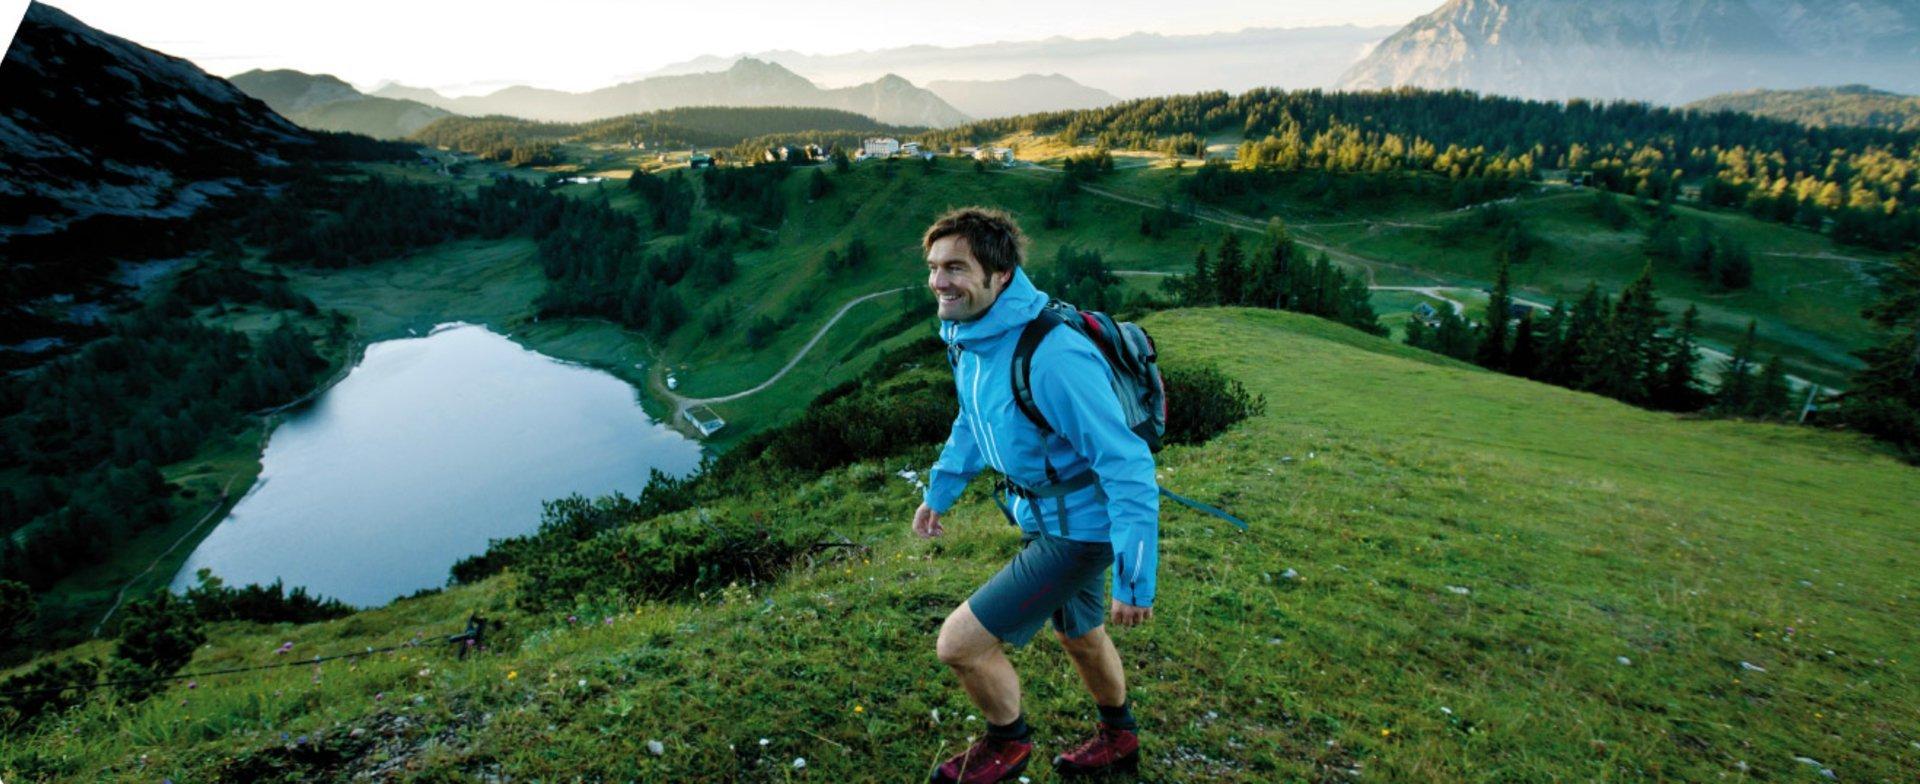 Urlaub im Wanderparadies